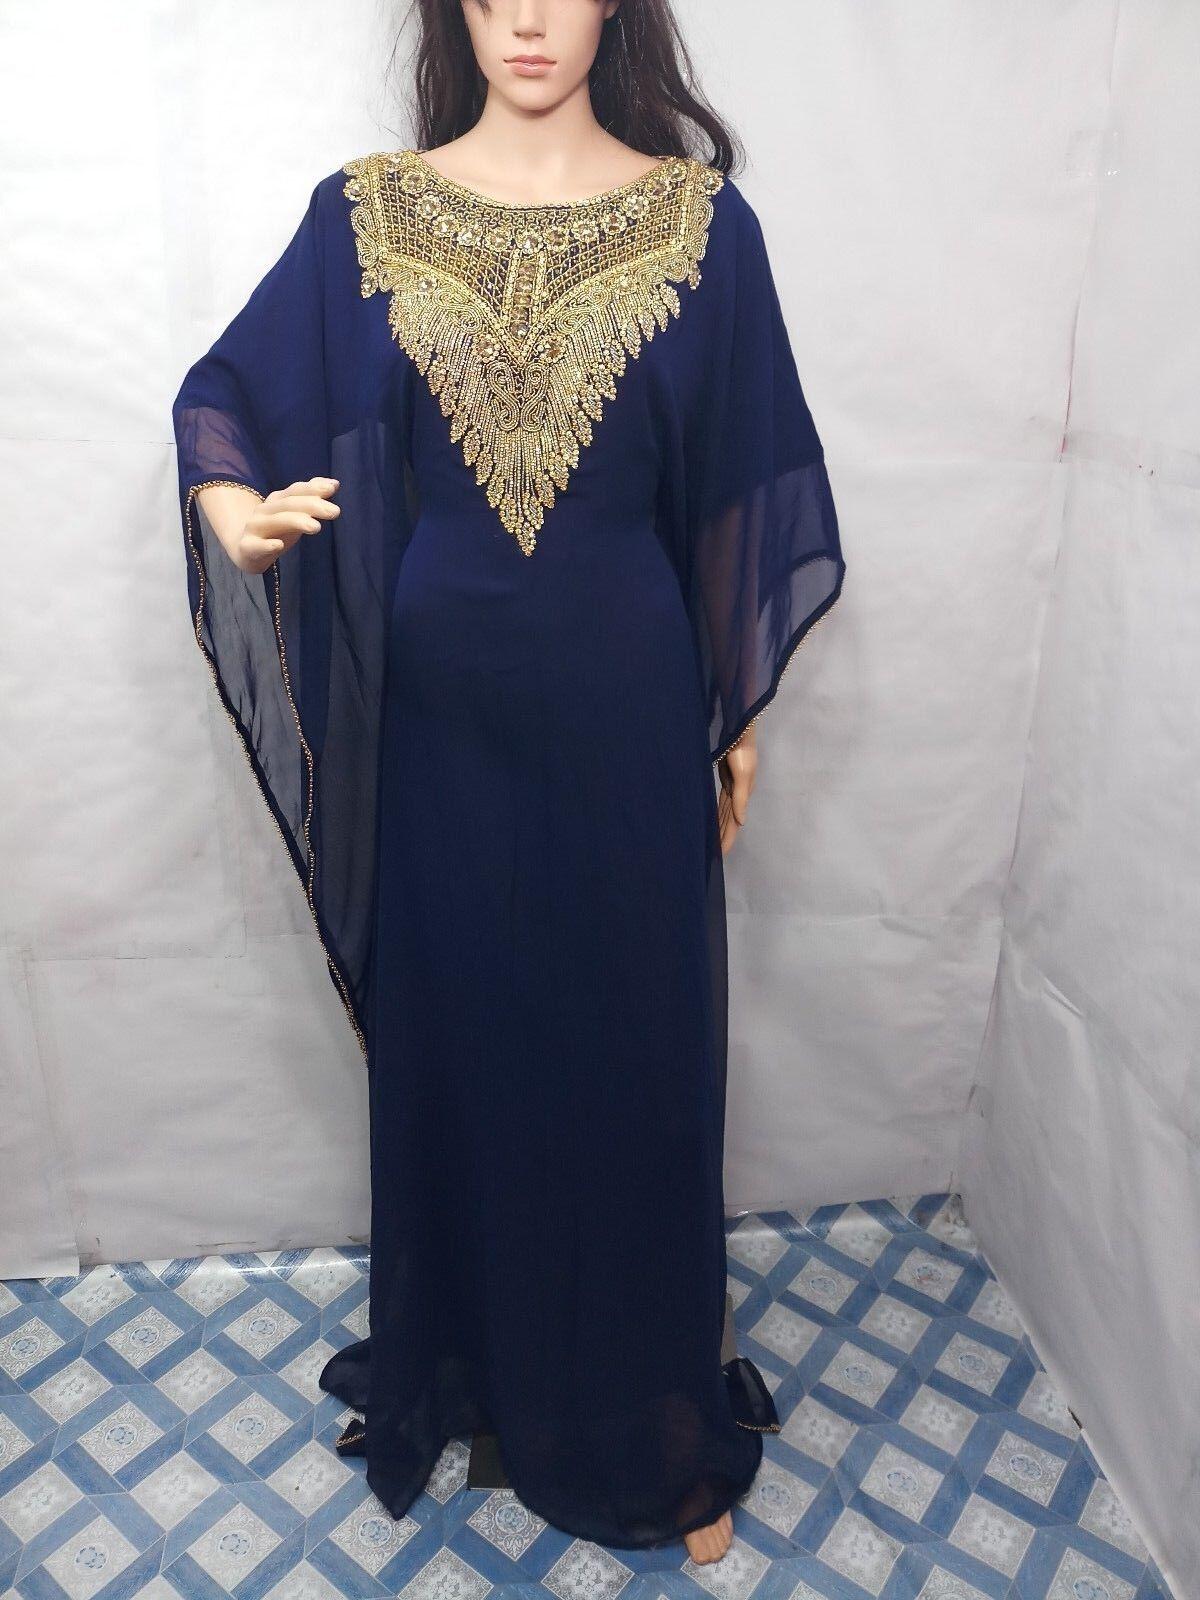 FARASHA DUBAI KAFTANS ABAYA DRESS VERY FANCY LONG STYLISH CAFTANS DRESS A843343